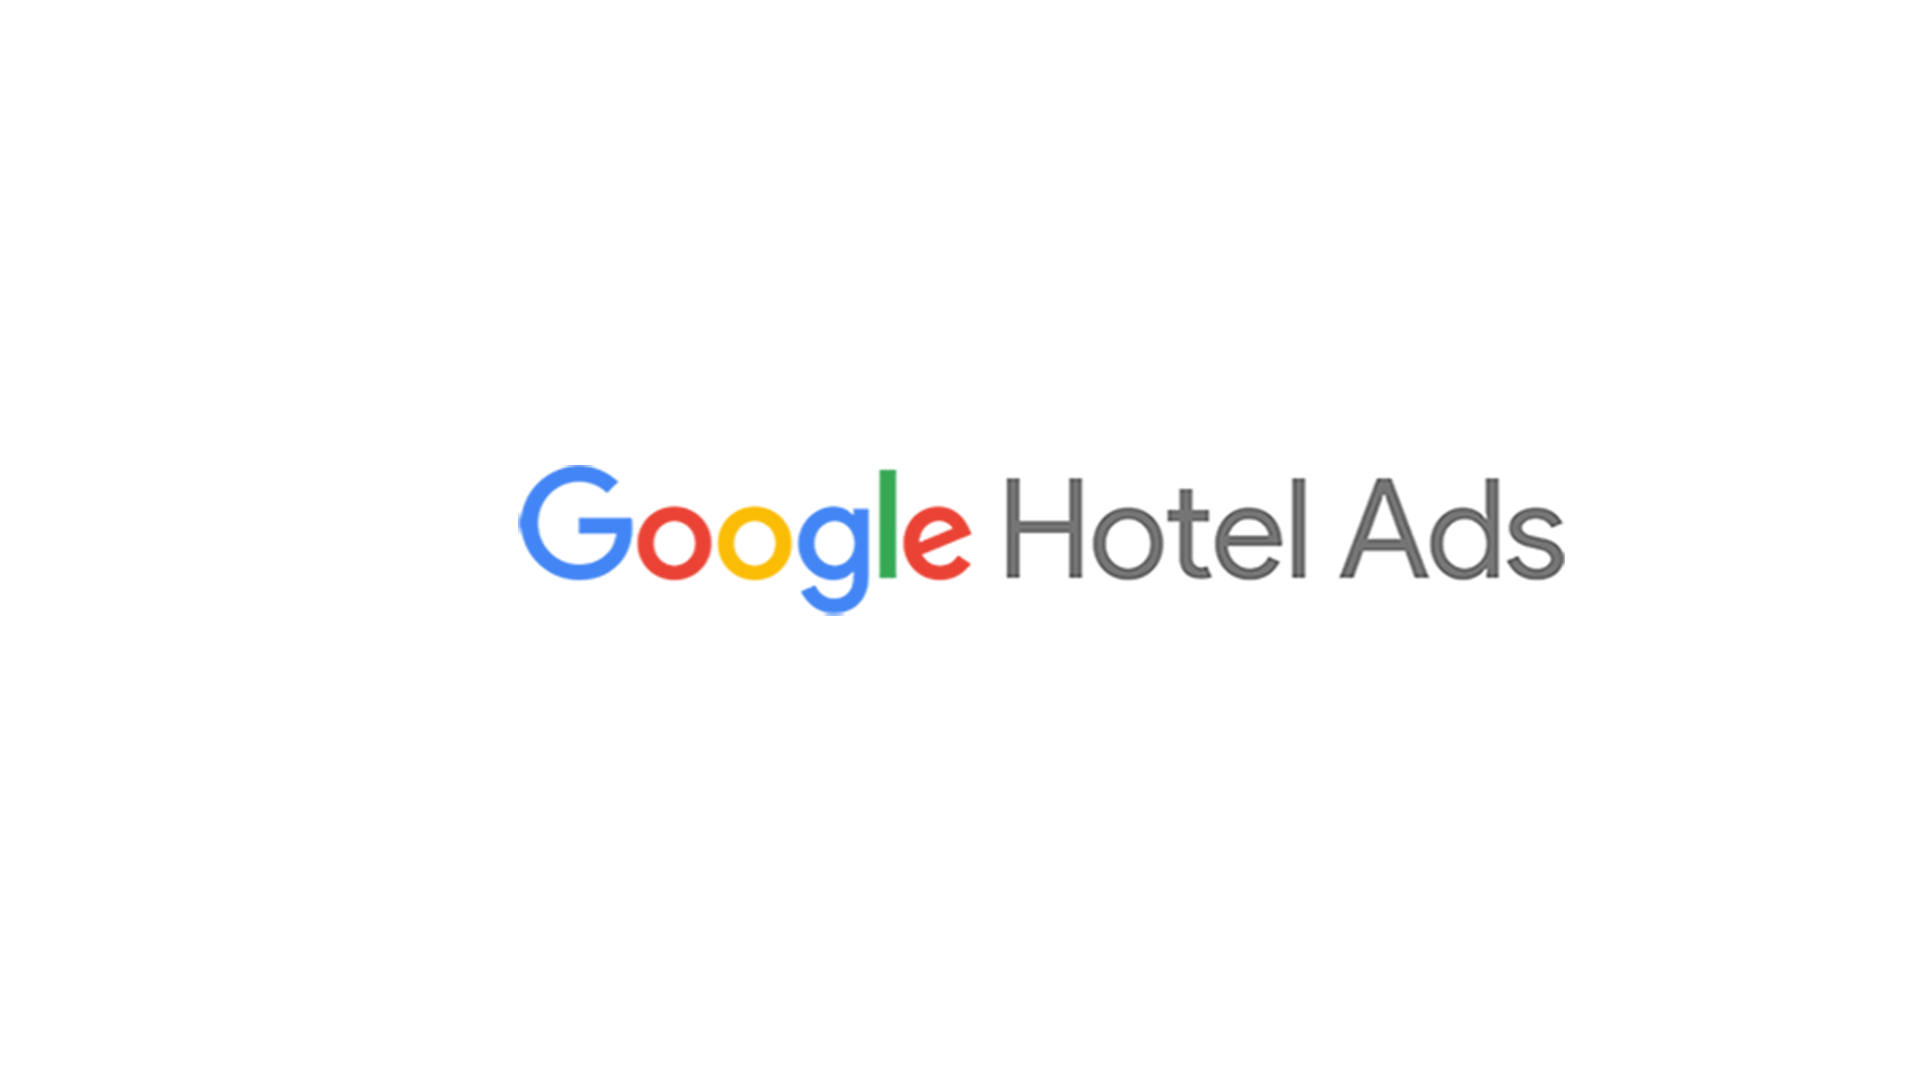 GoogleHotelAds